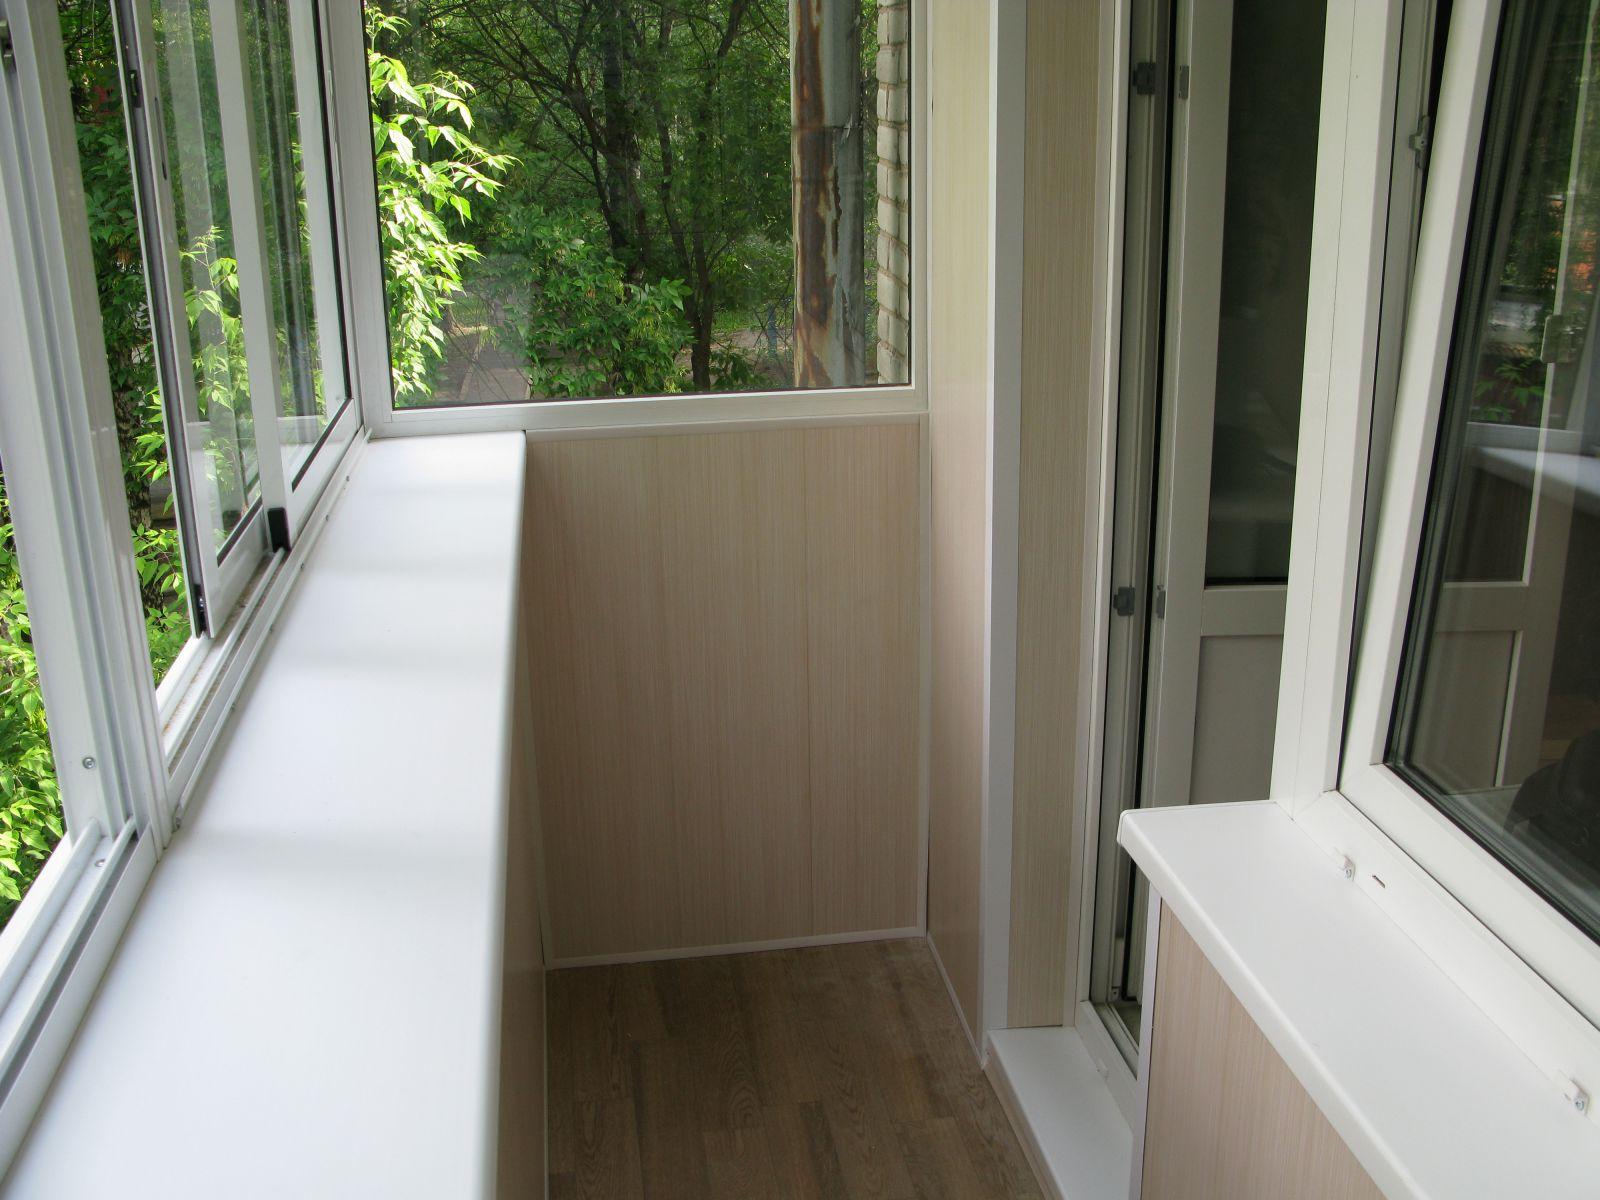 Остекление и отделка балкона под ключ цена.